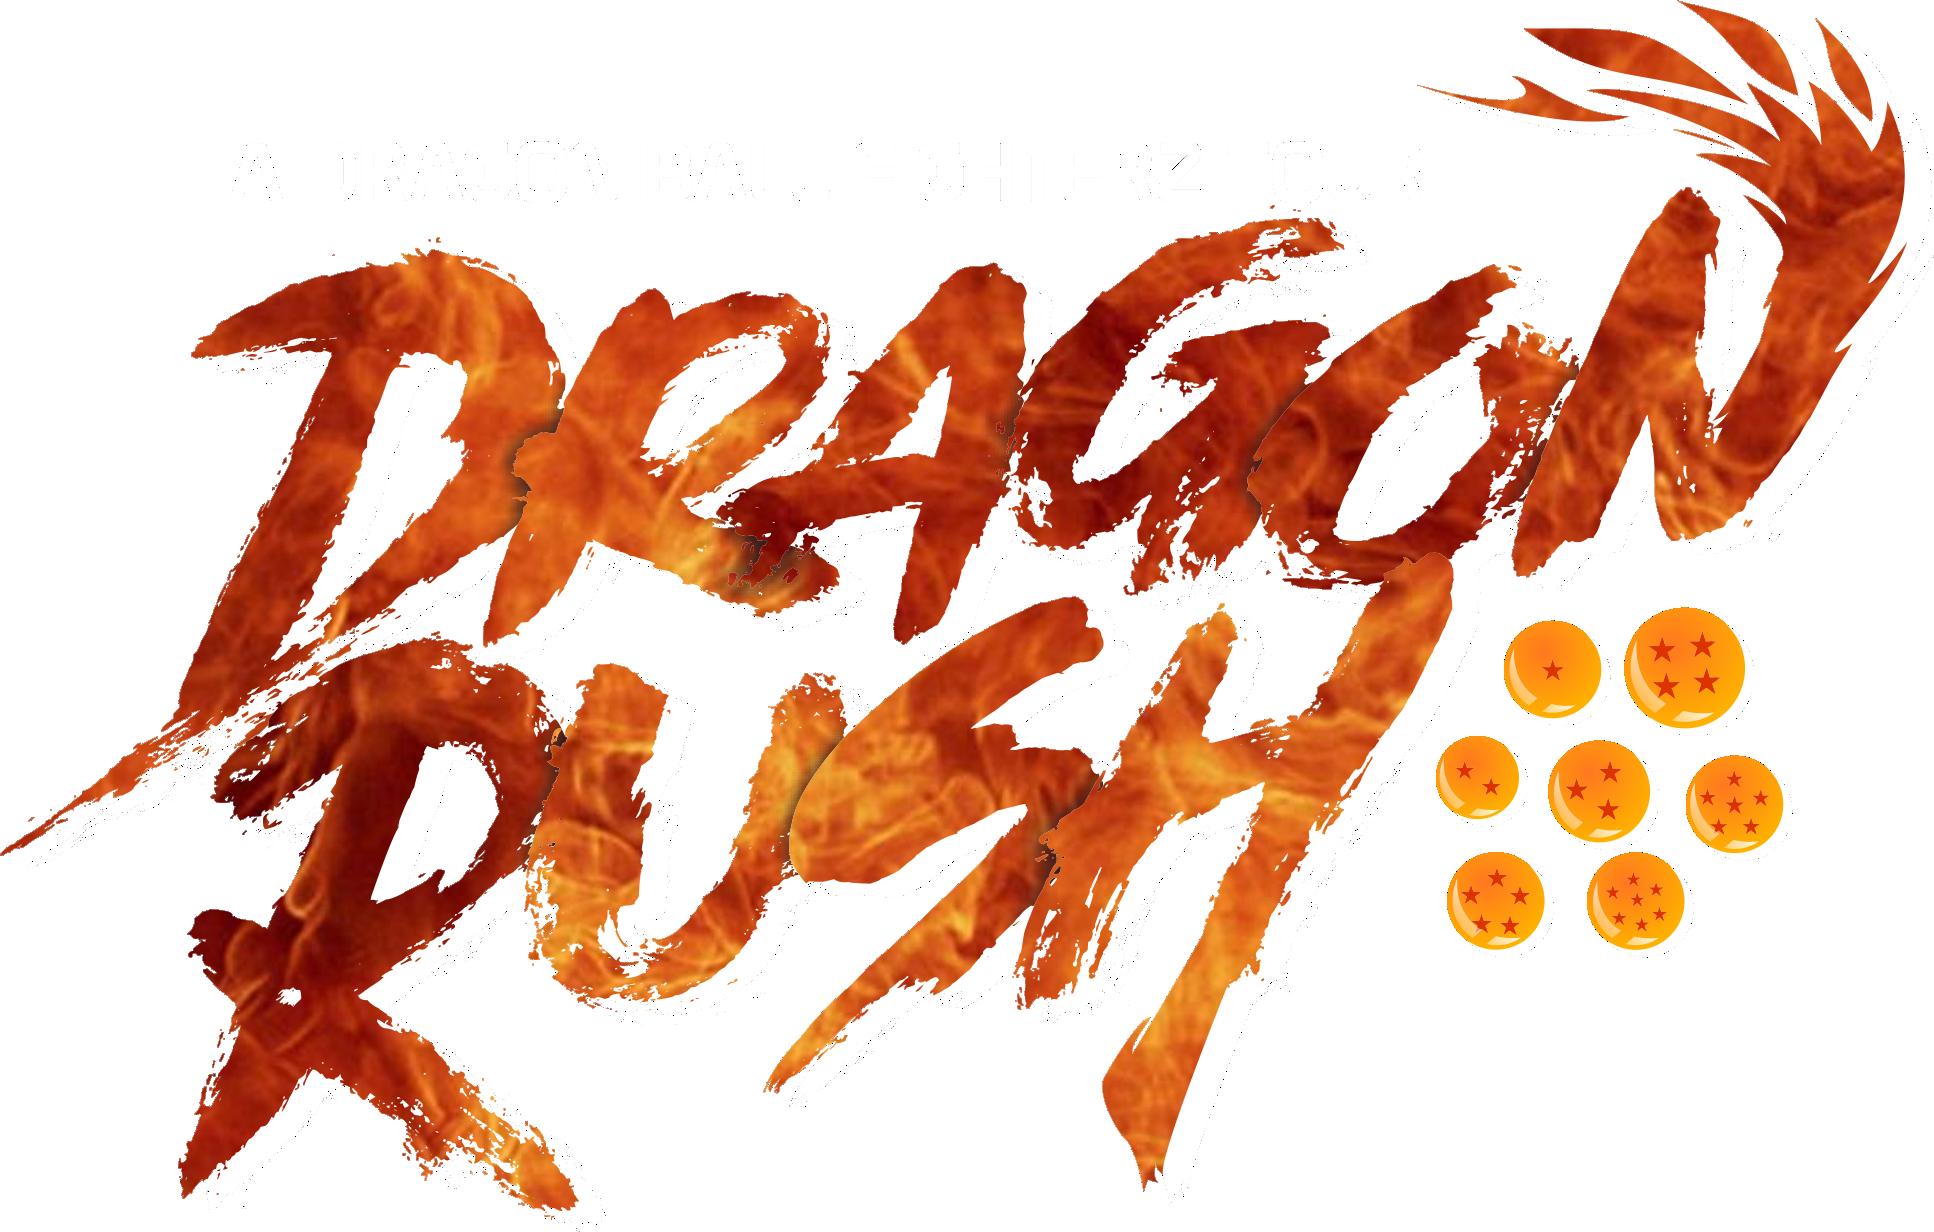 DRAGON RUSH BATTLE #6